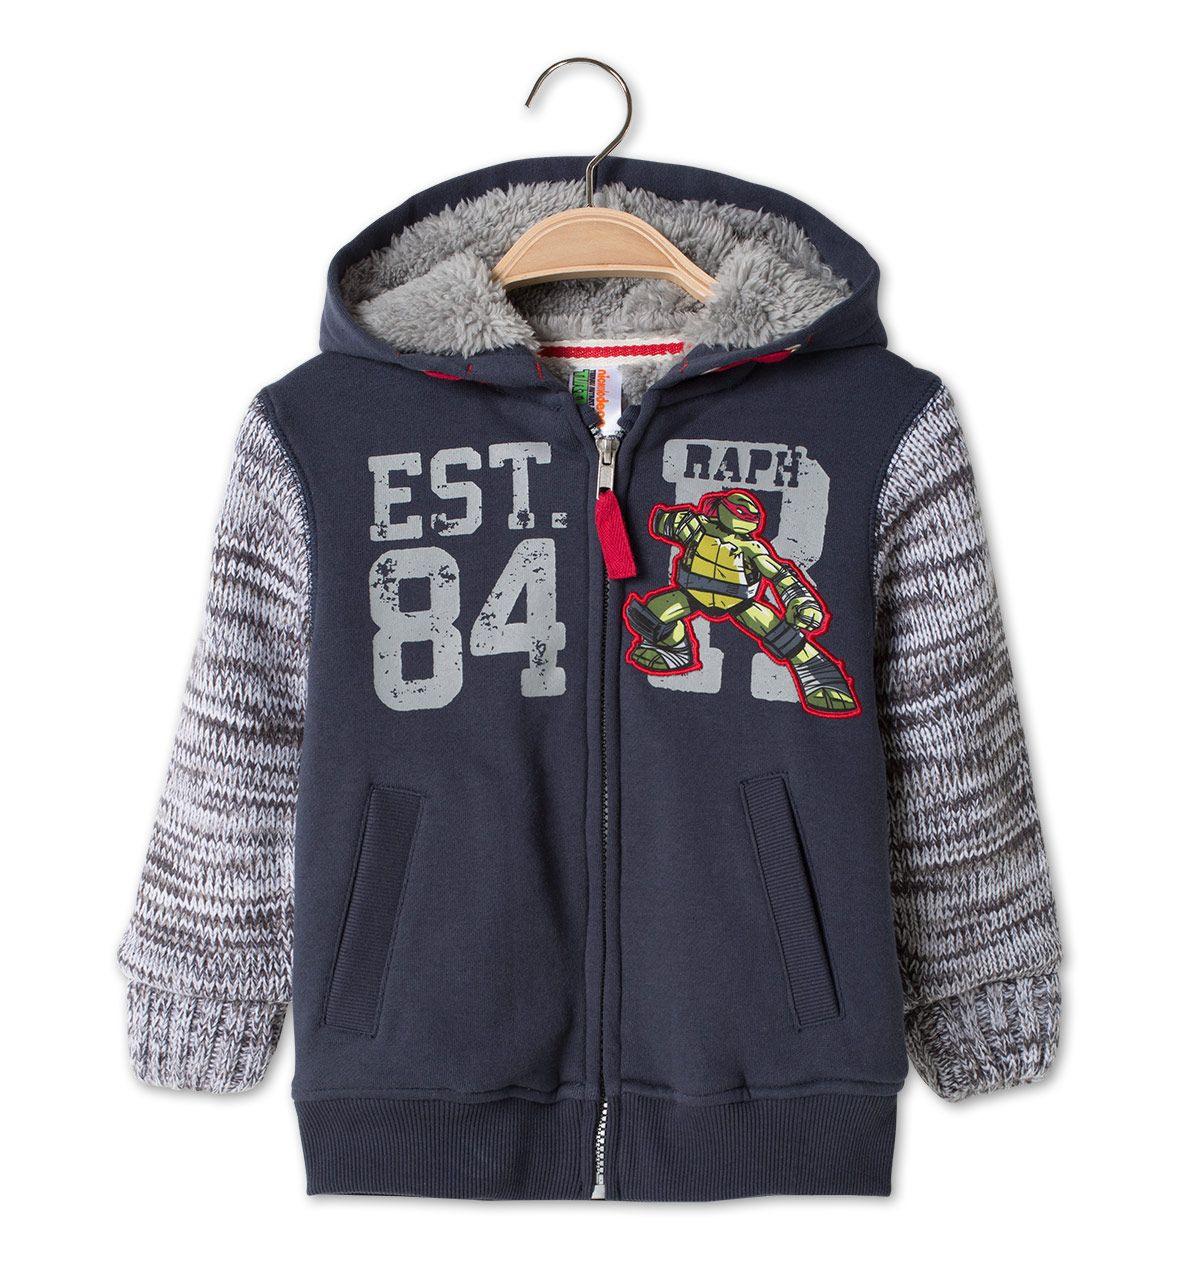 Ca 2015  Fashion Clothes Hoodies